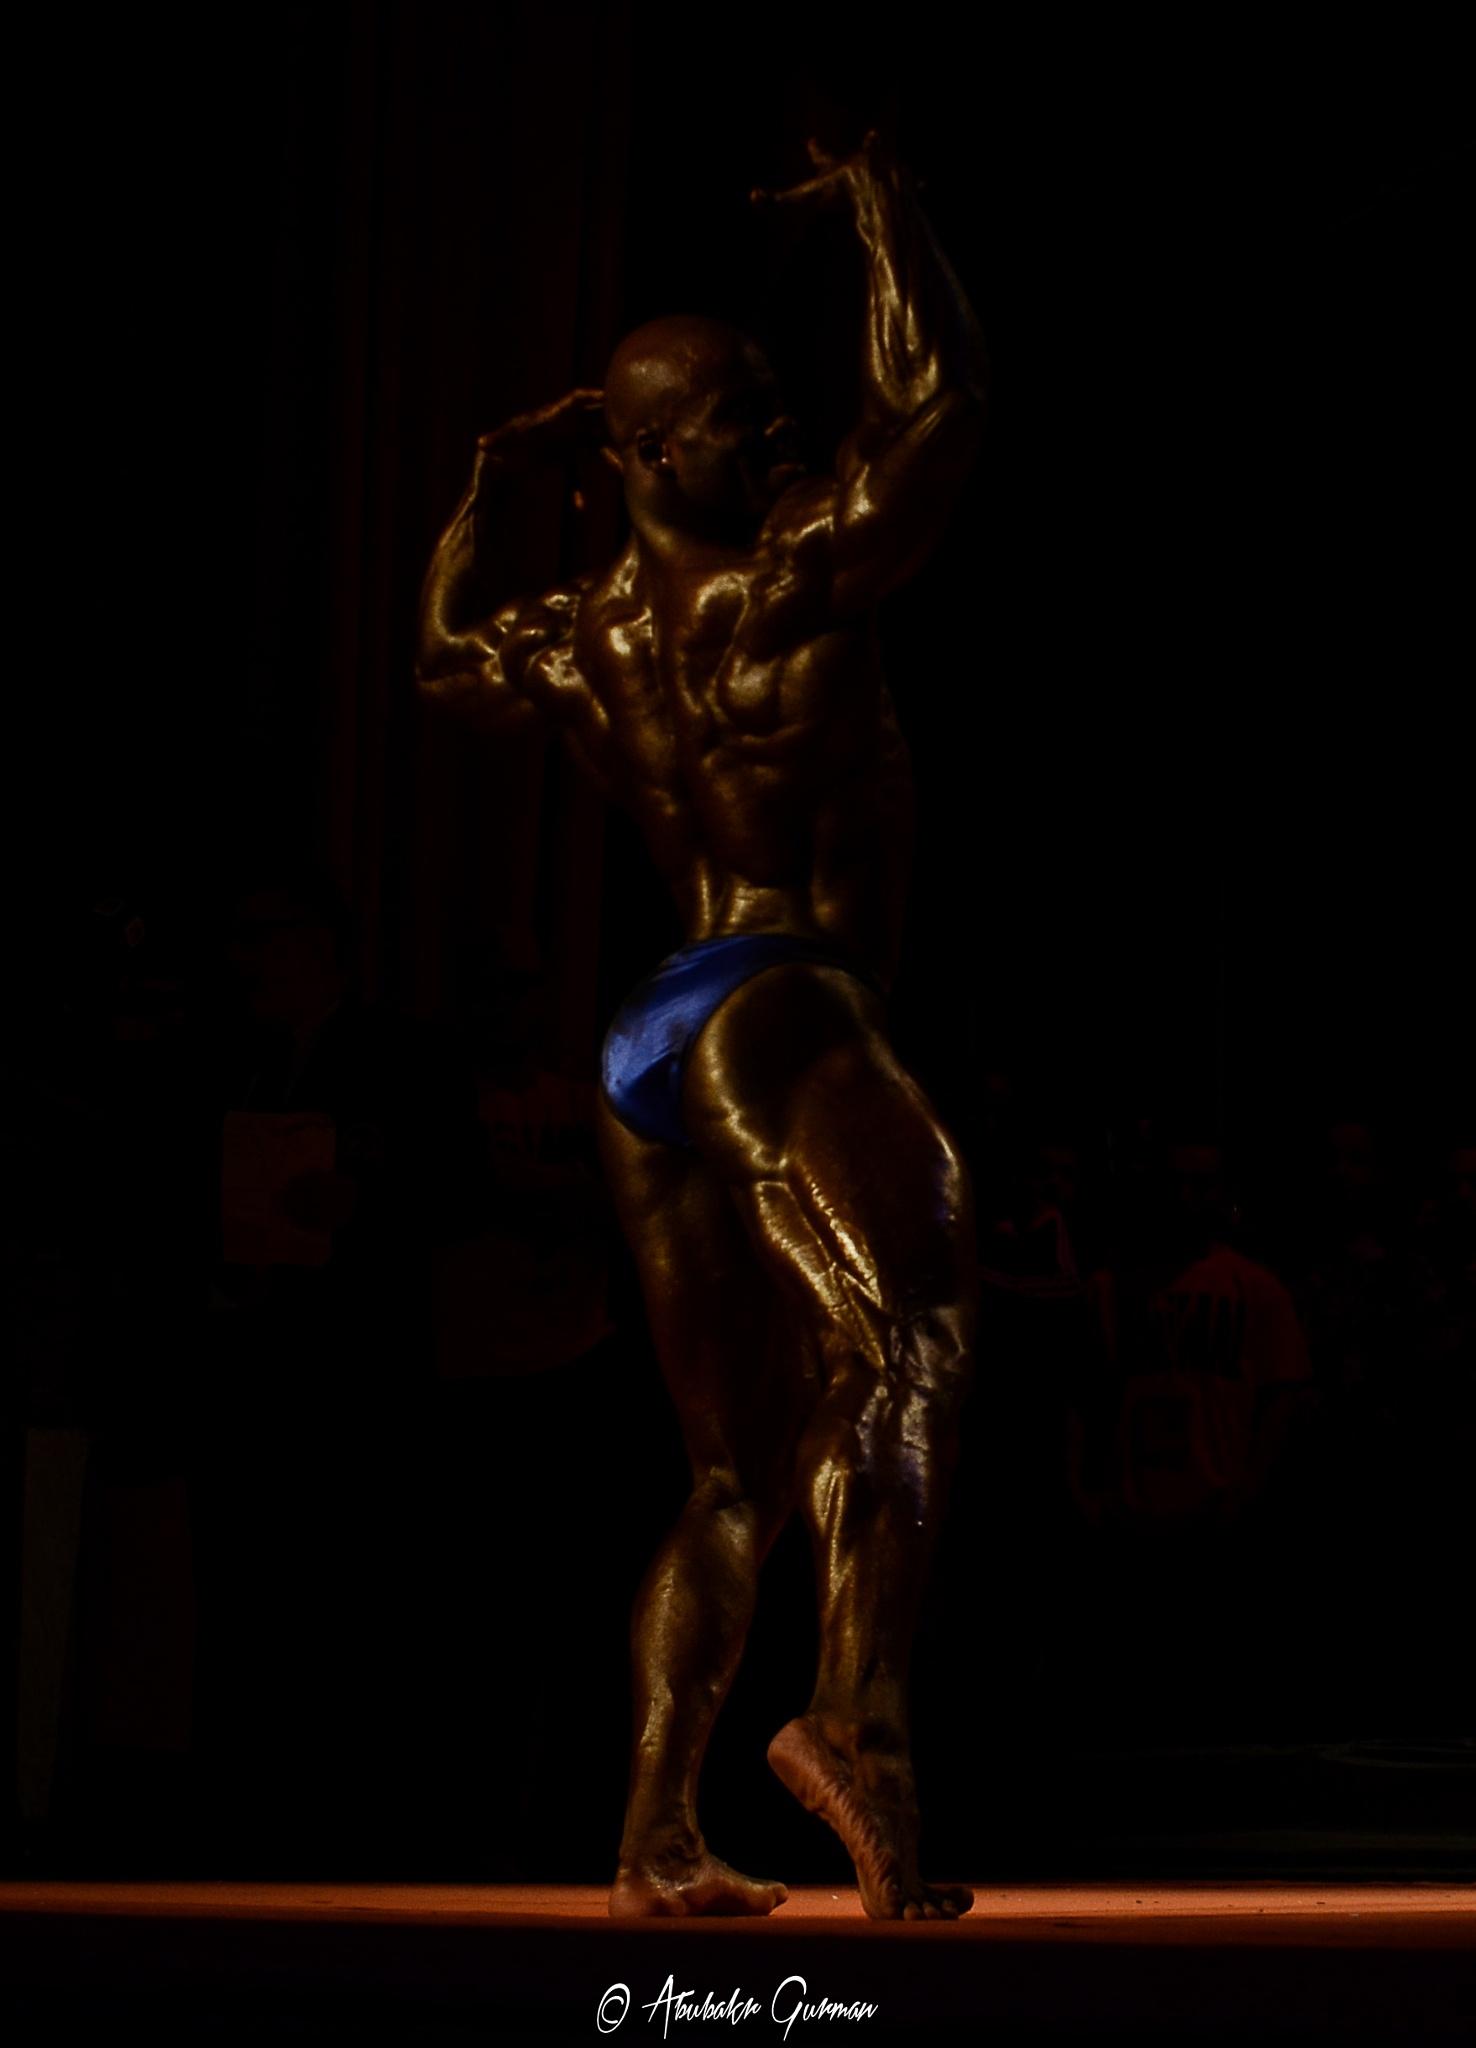 Bodybuilding  by Abubakr Gurman